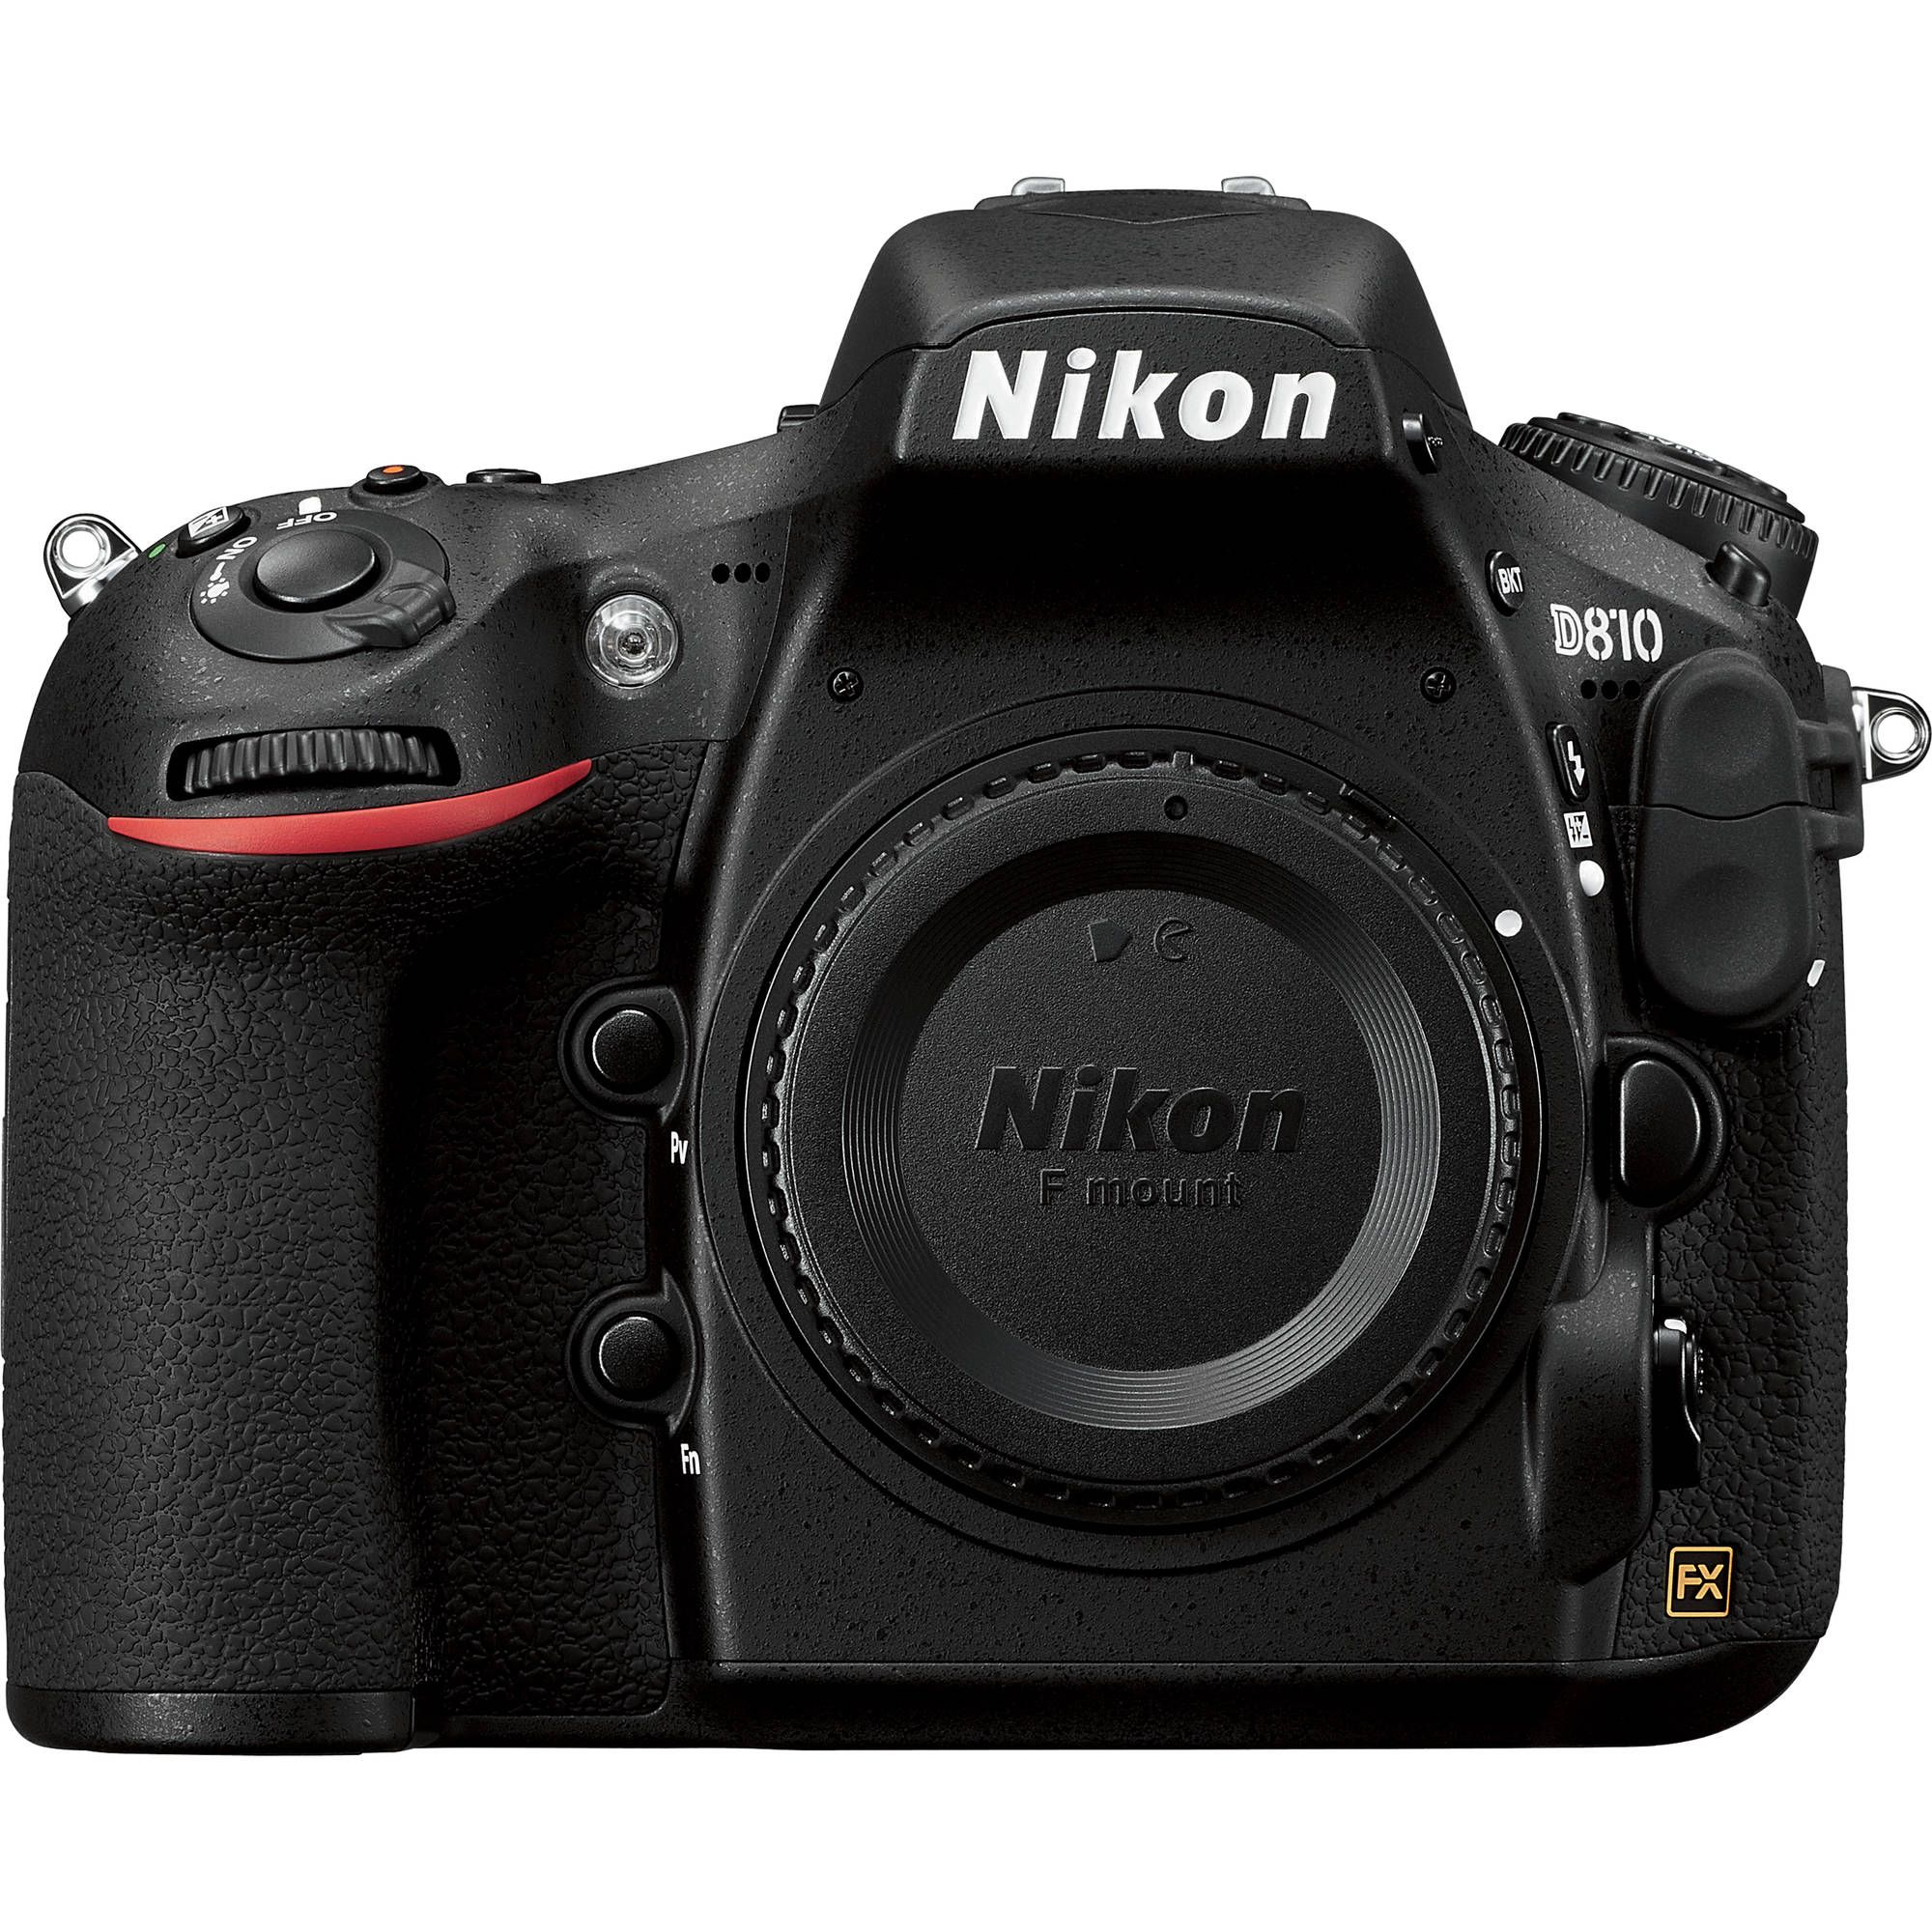 NikonD810